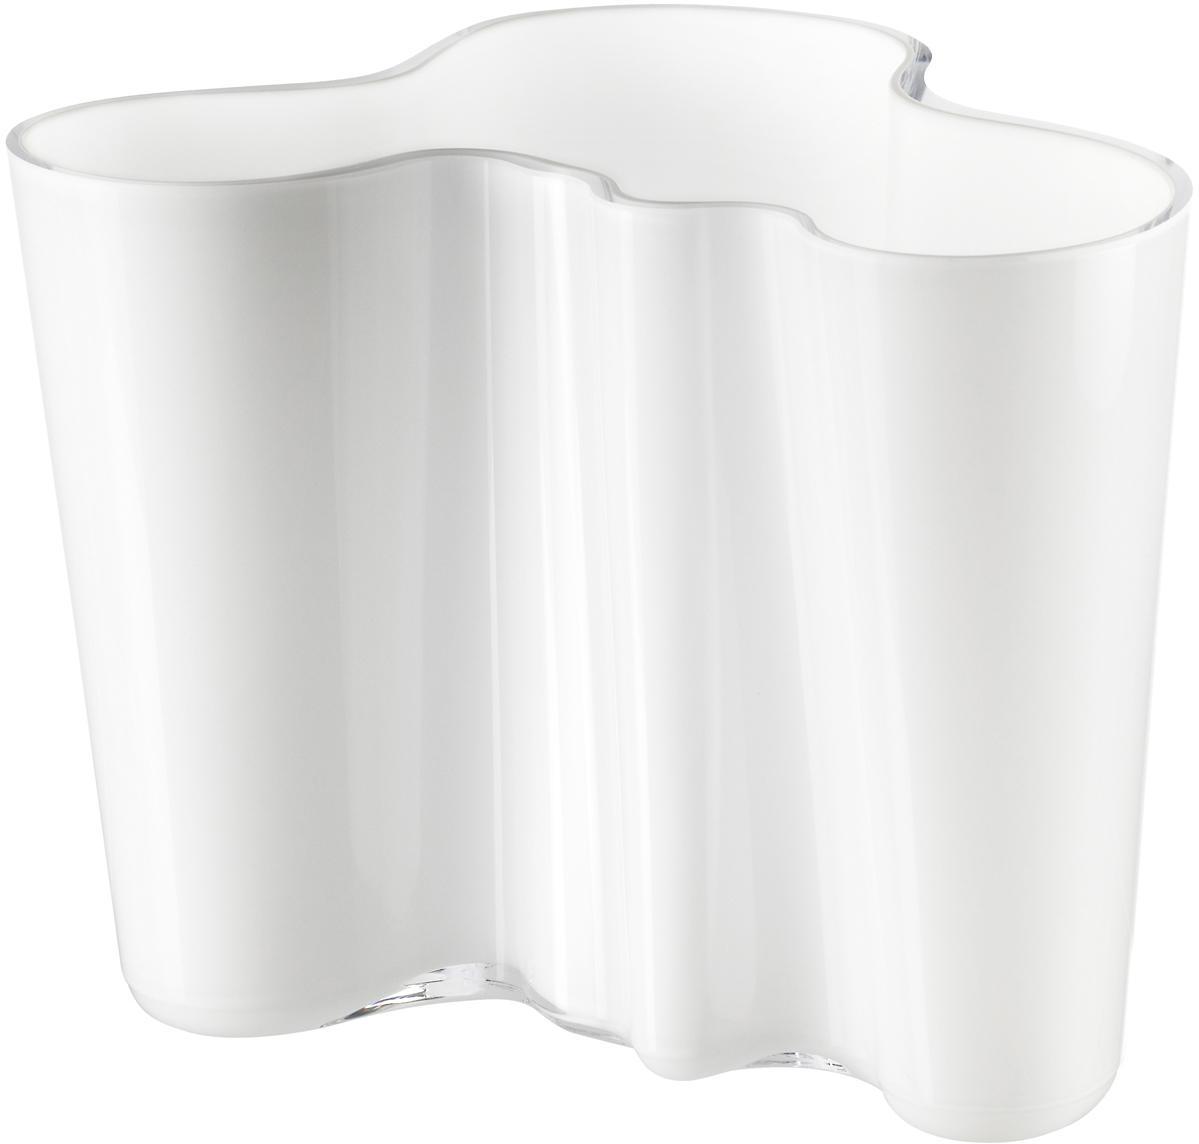 Kleine design vaas Alvar Aalto, Glas, Wit, H 16 cm